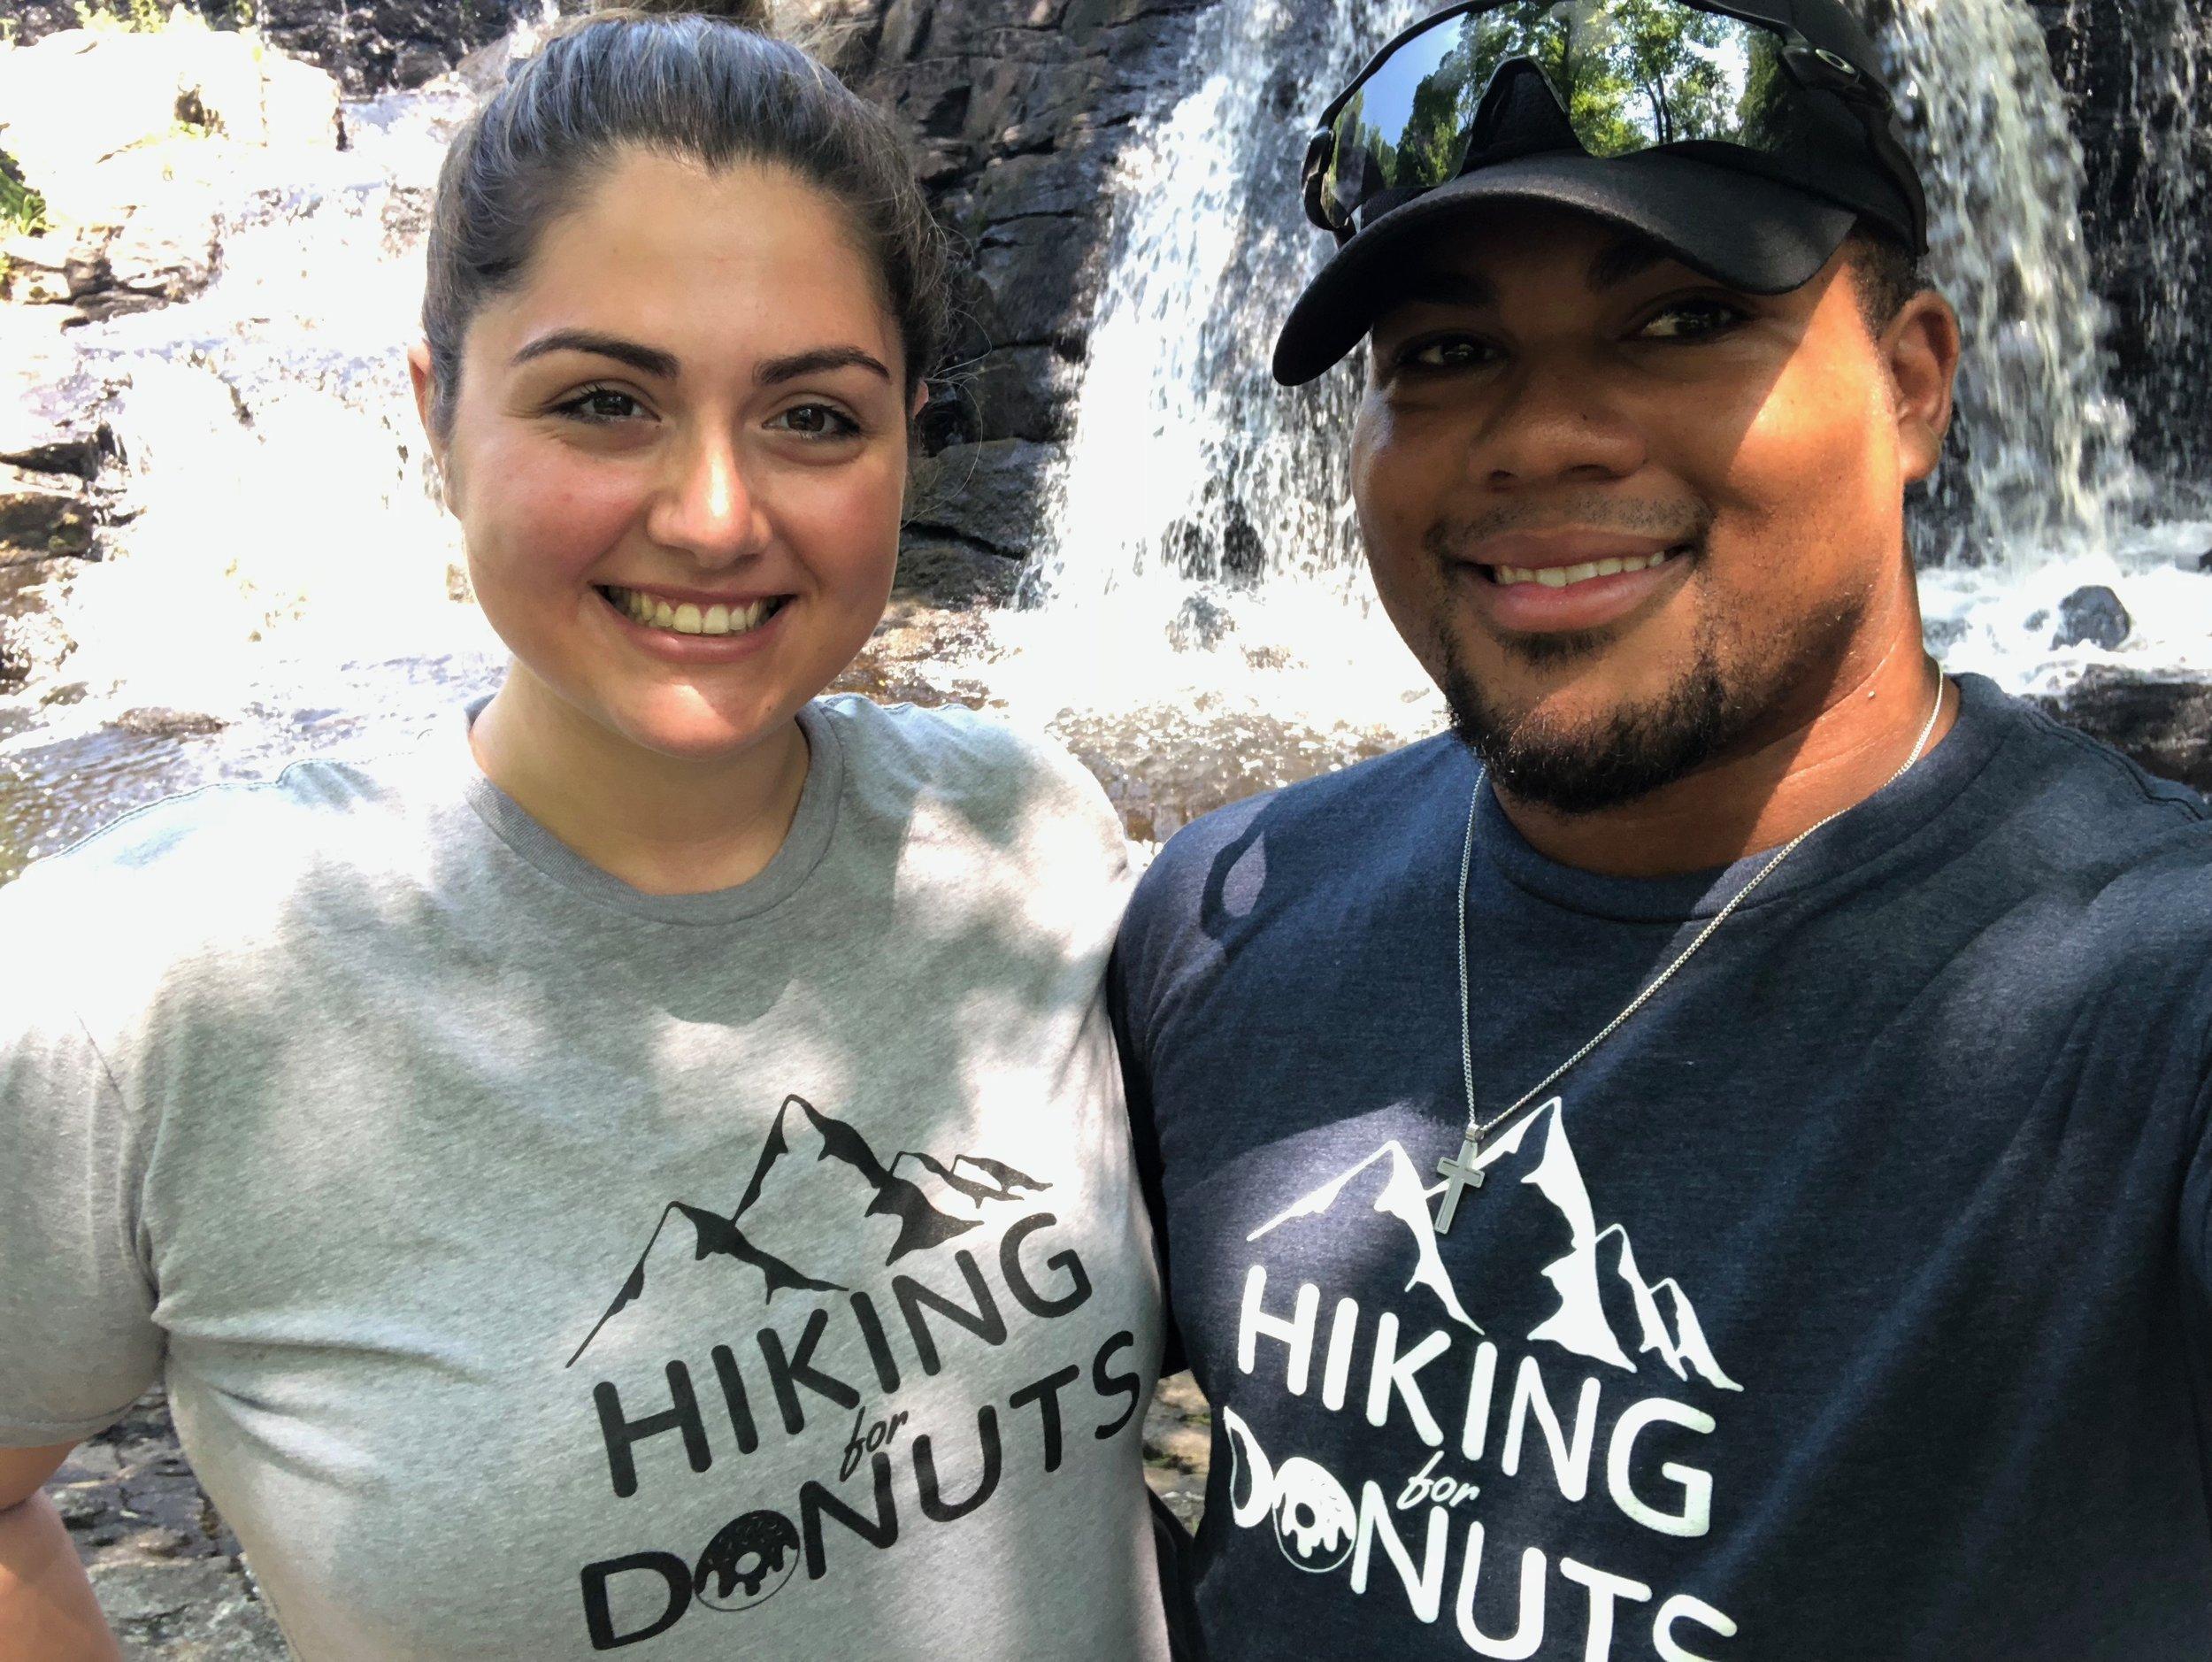 SabrinaandDre Hiking in Connecticut